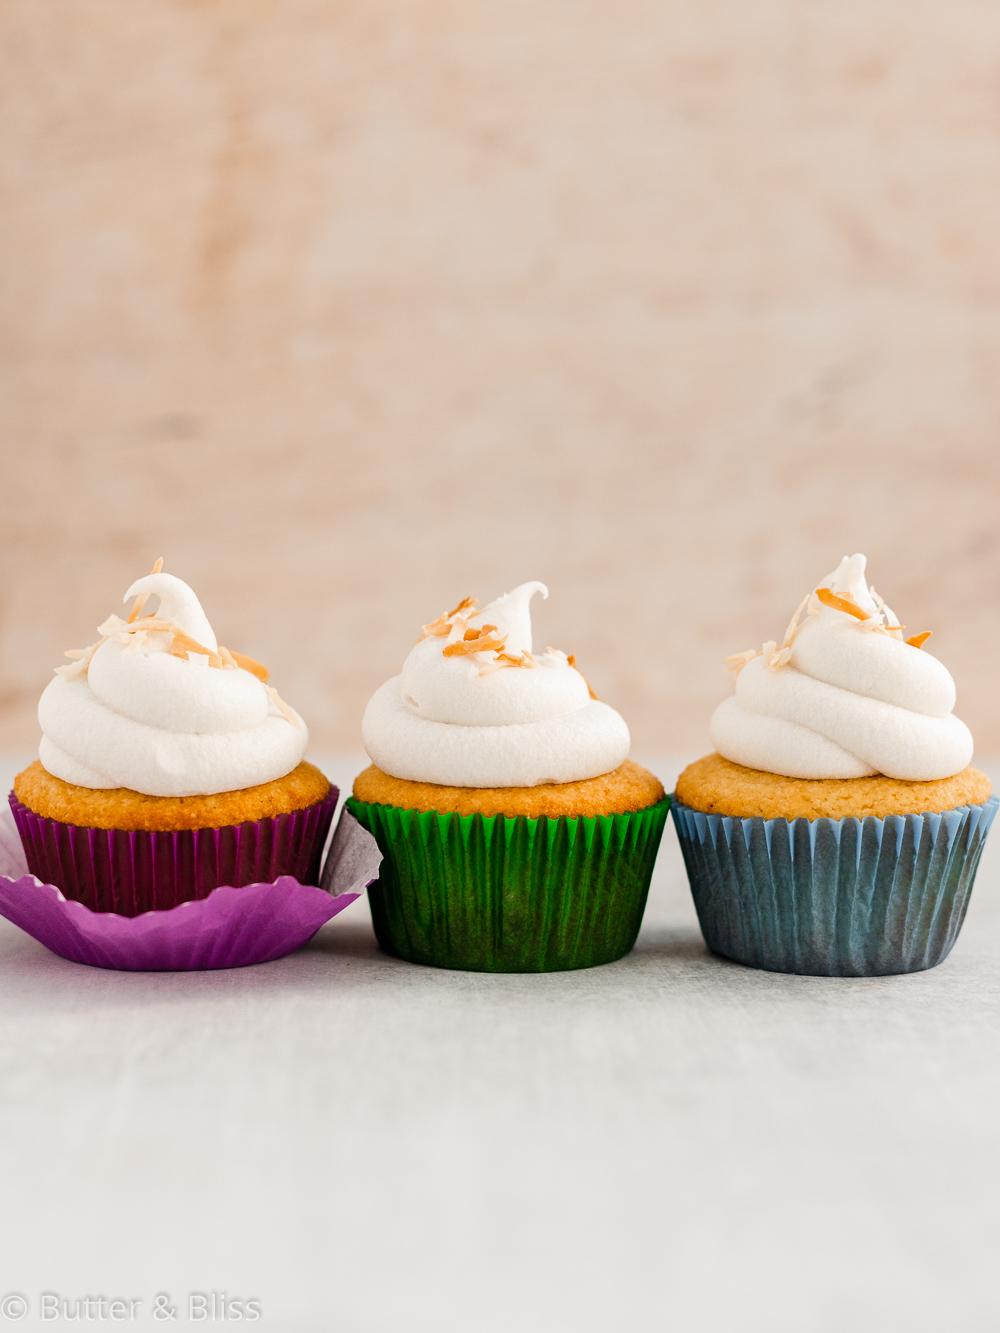 Gluten free vanilla cupcakes in a row